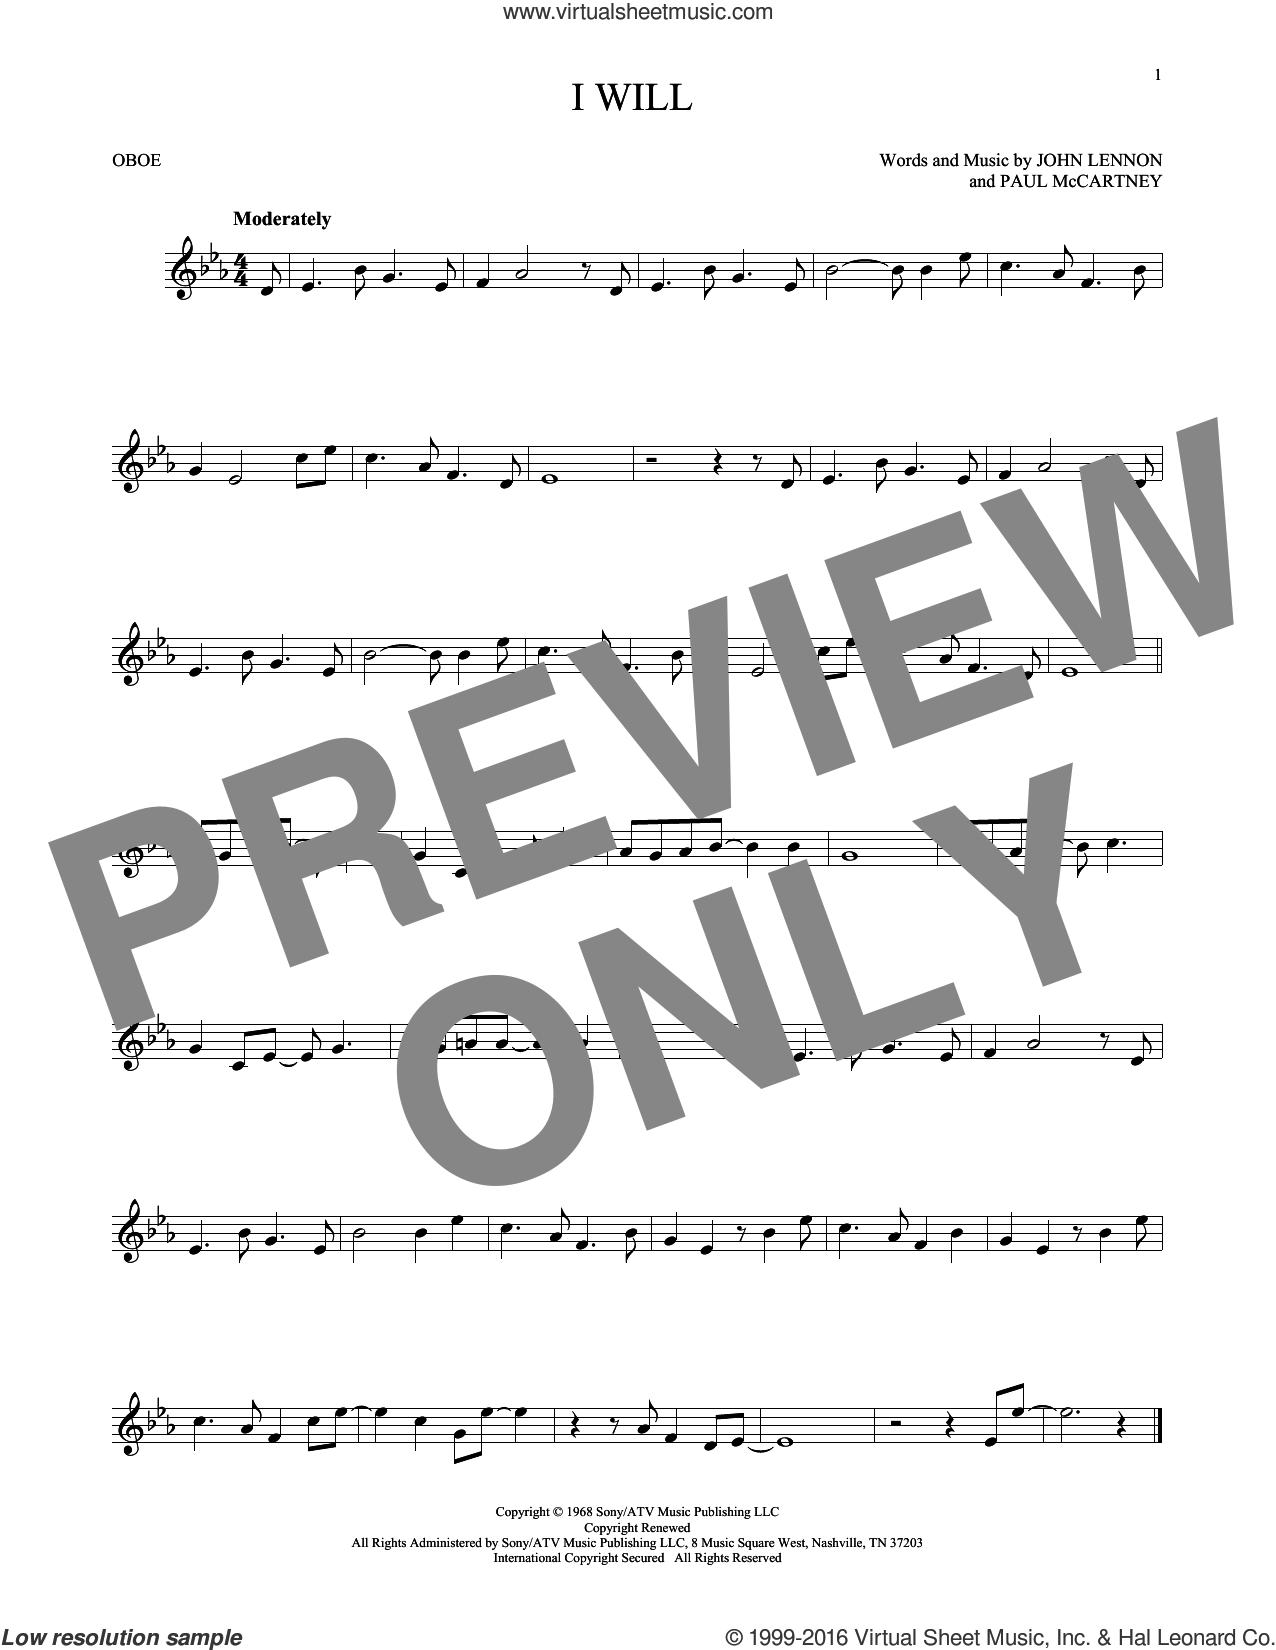 I Will sheet music for oboe solo by The Beatles, John Lennon and Paul McCartney, intermediate skill level